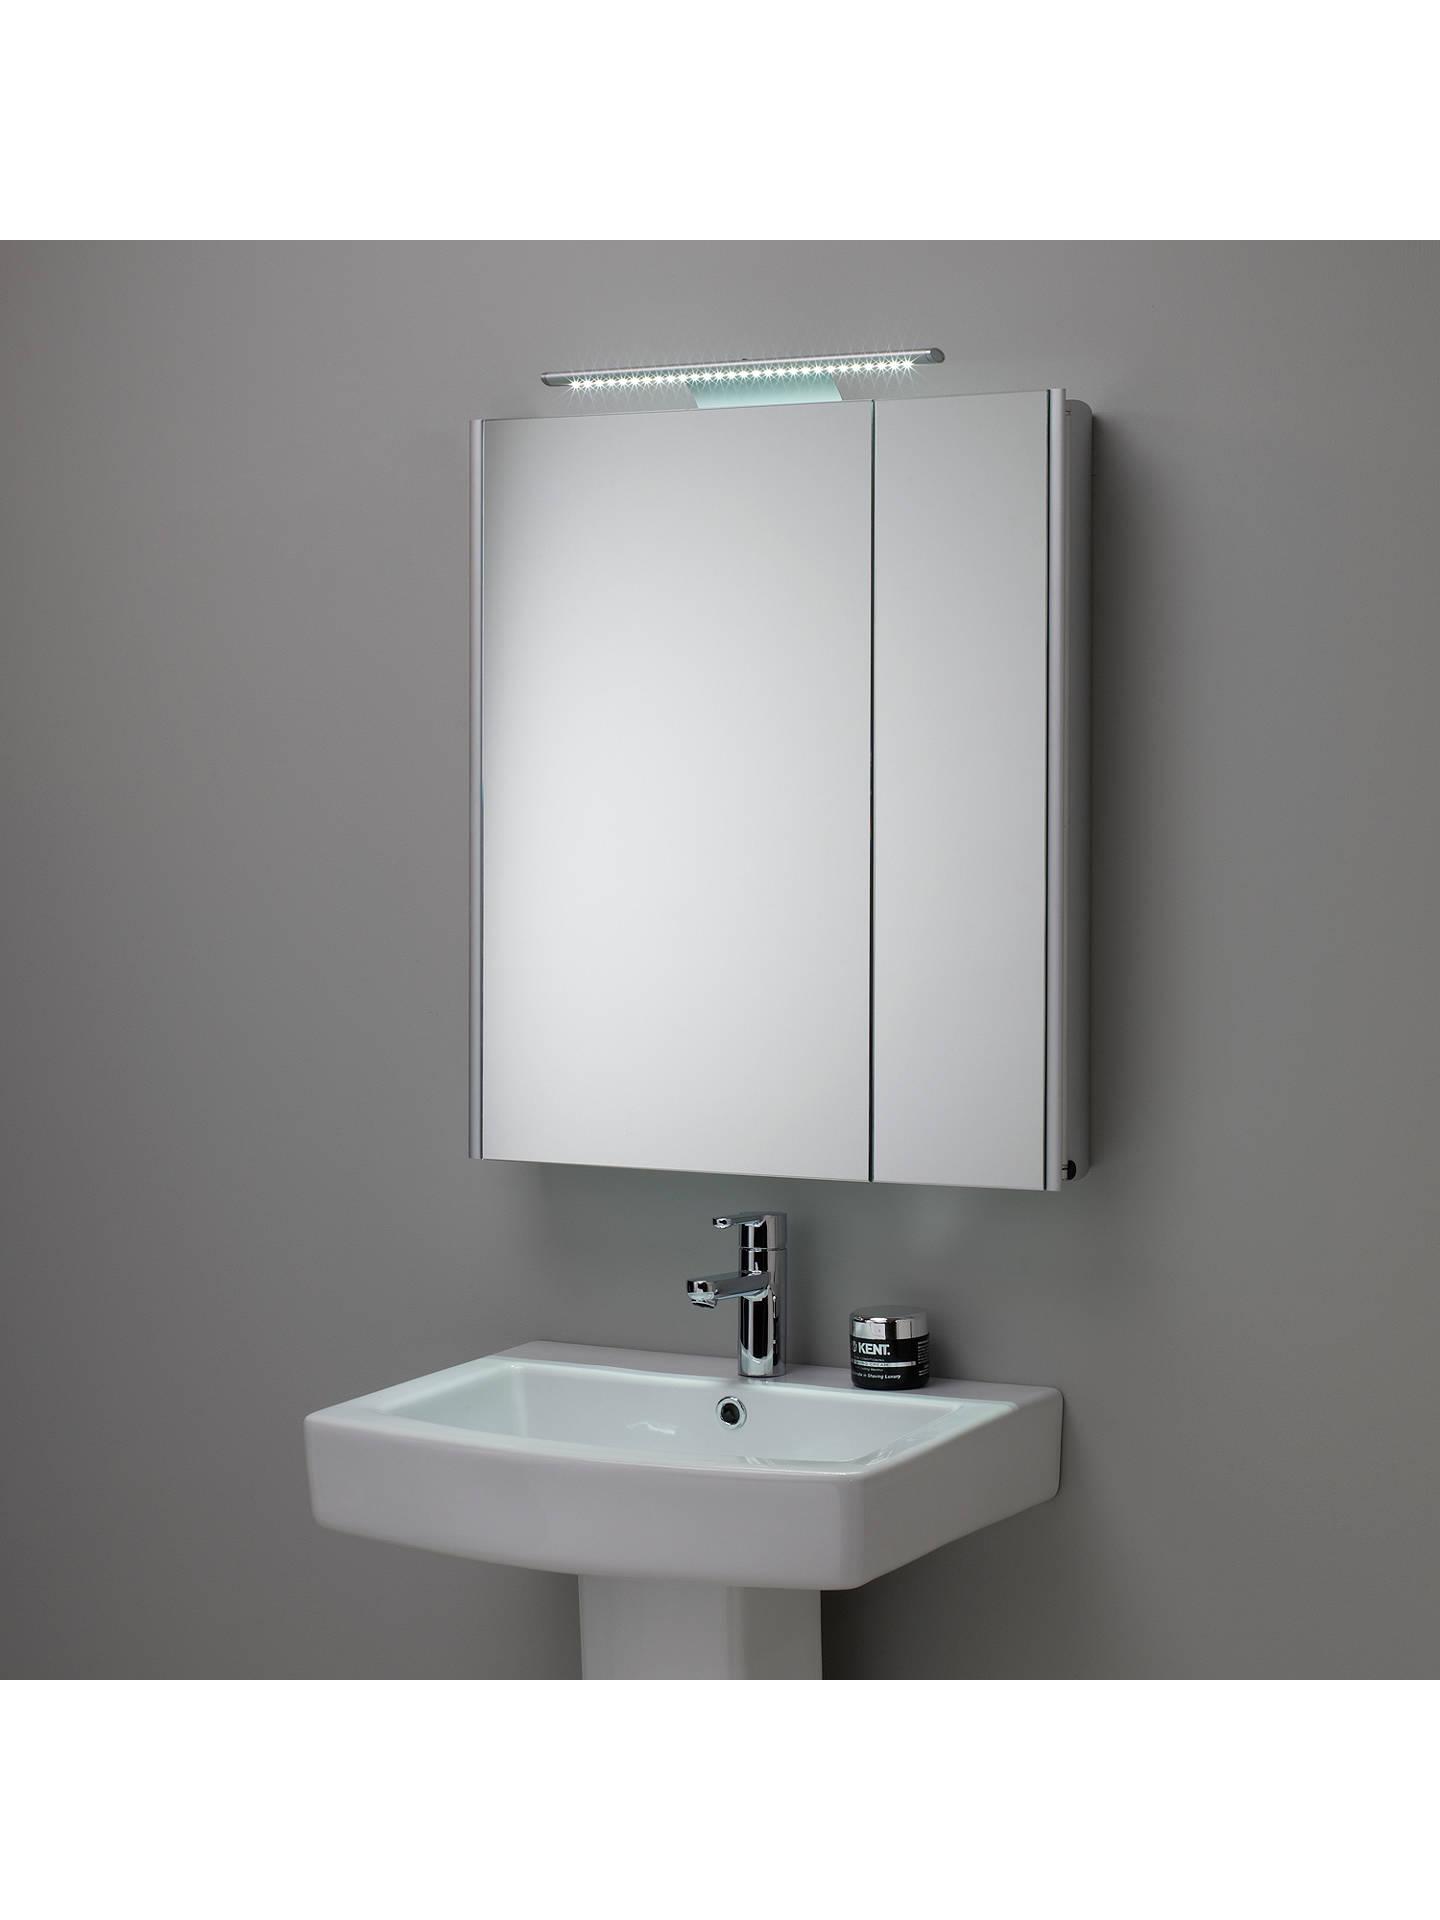 Roper Rhodes Refine Illuminated Double Mirrored Bathroom Cabinet At